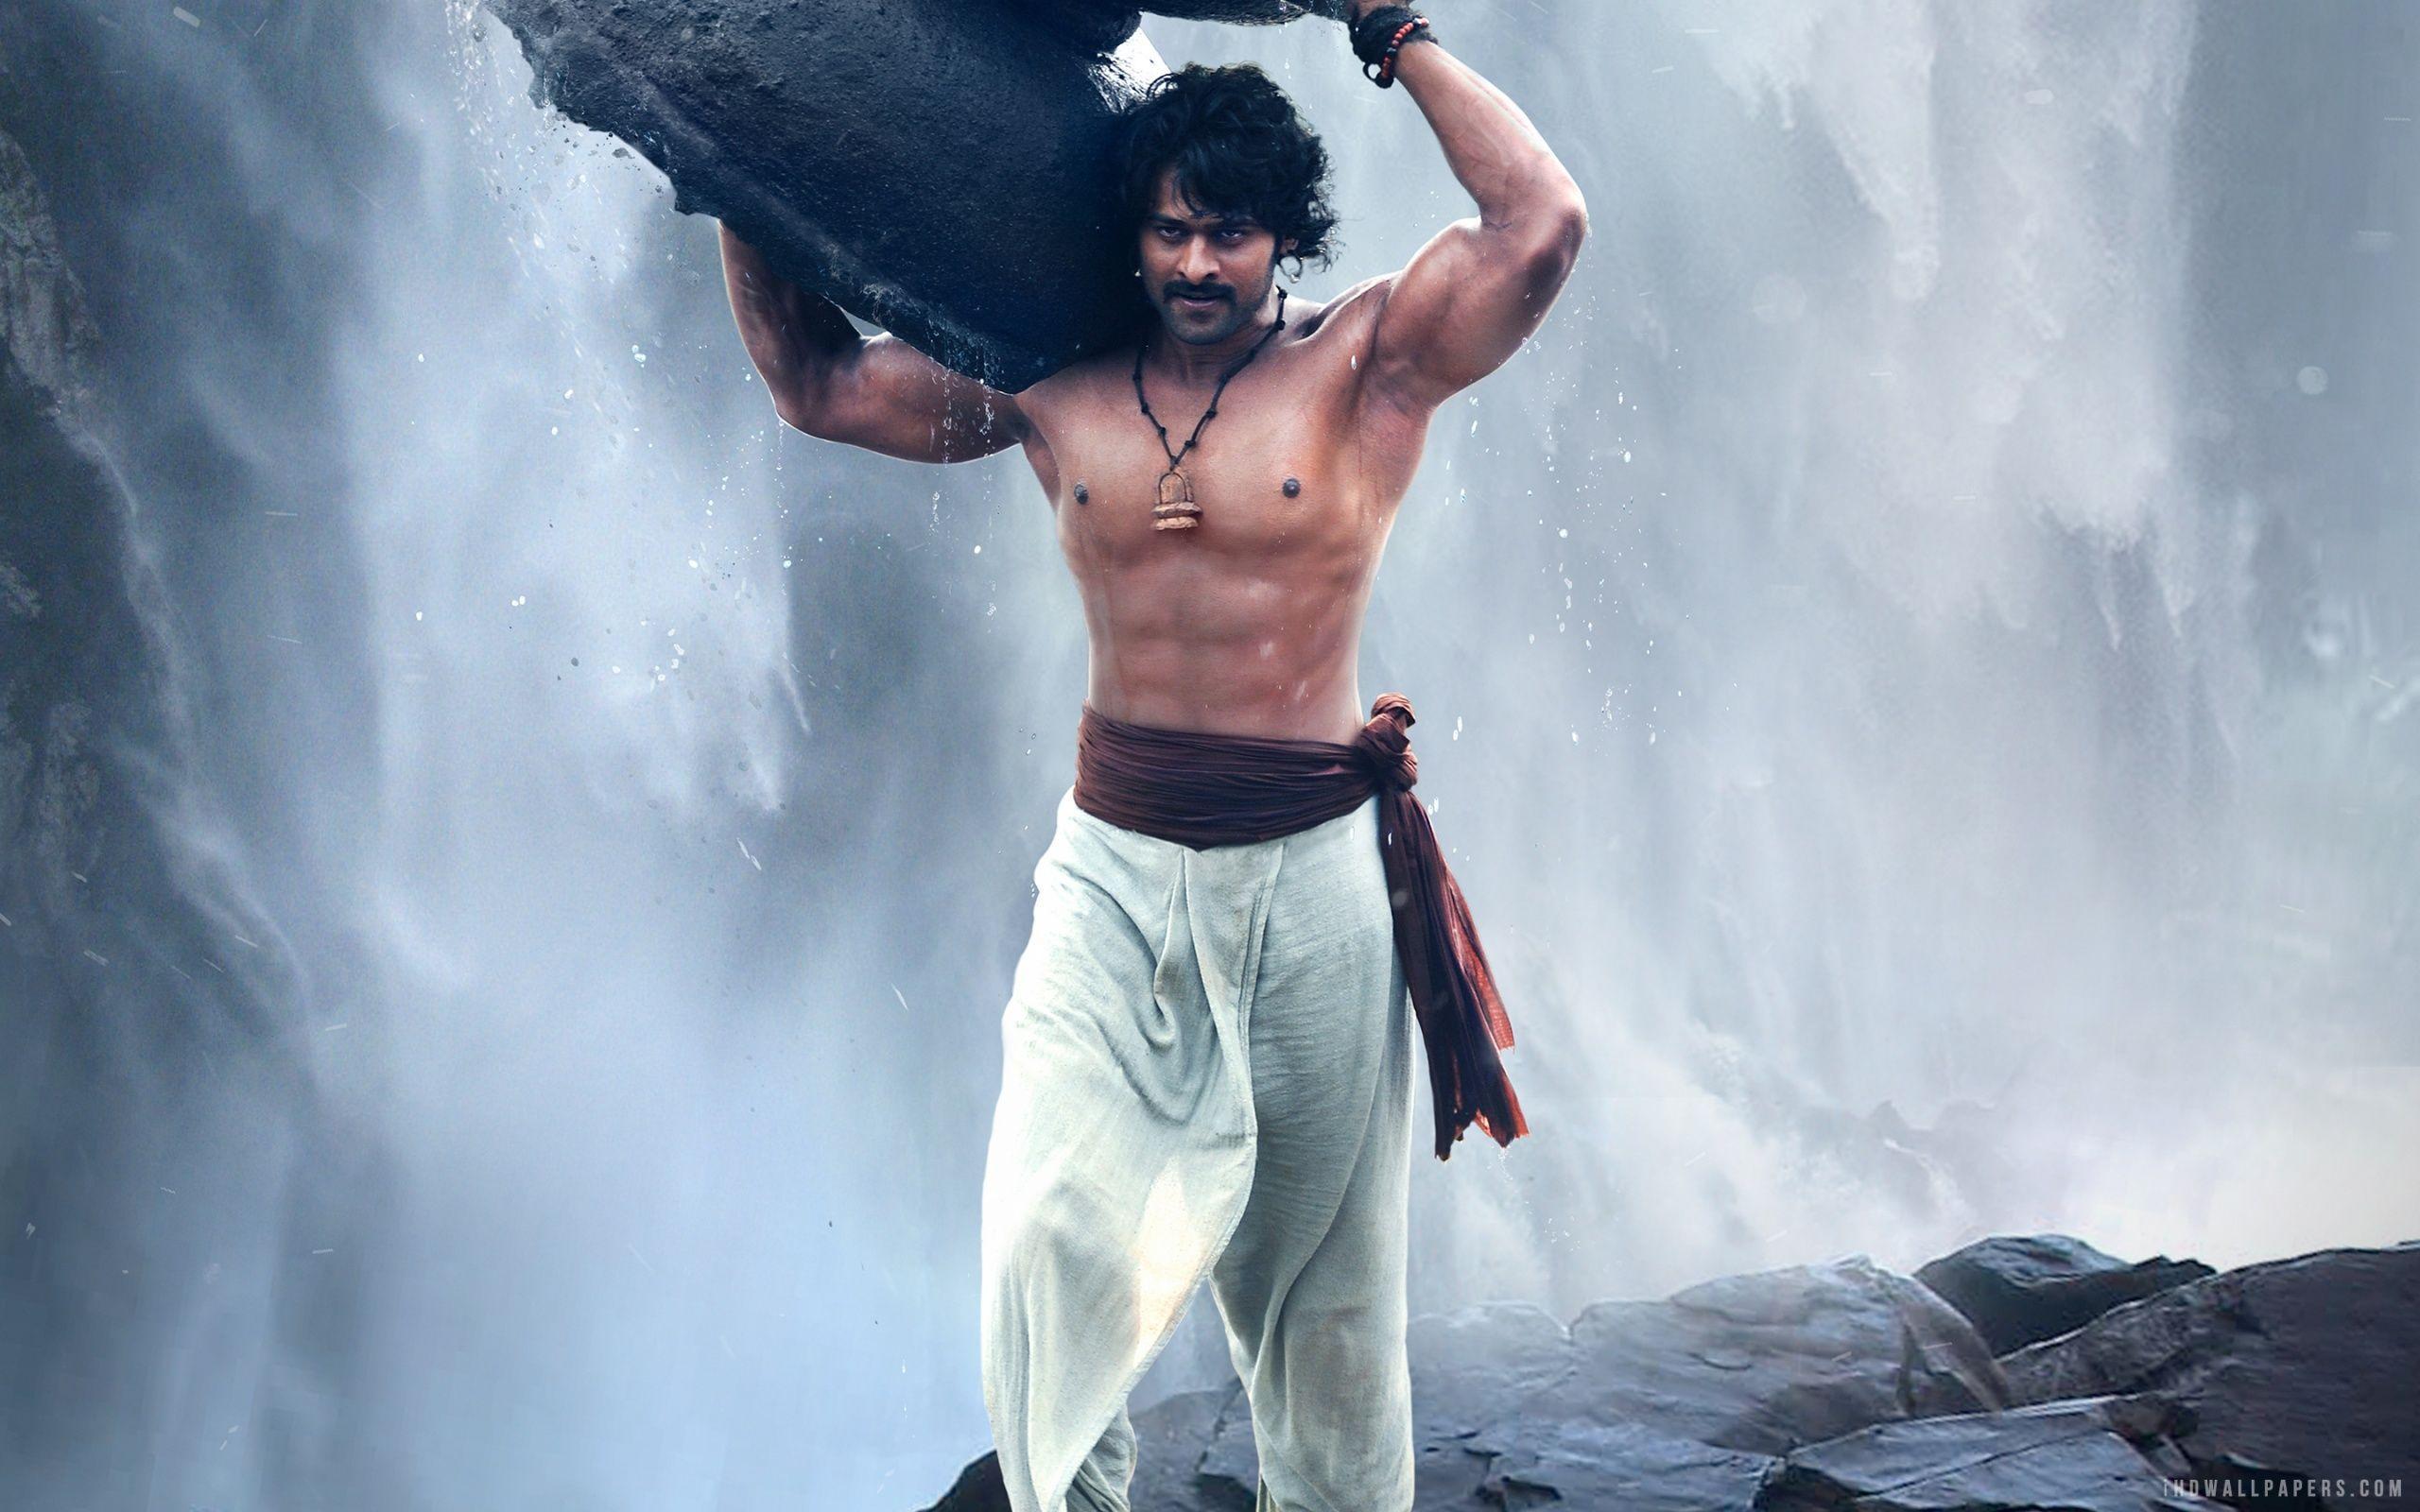 Prabhas as Shivudu in Baahubali HD Wallpaper - iHD Wallpapers